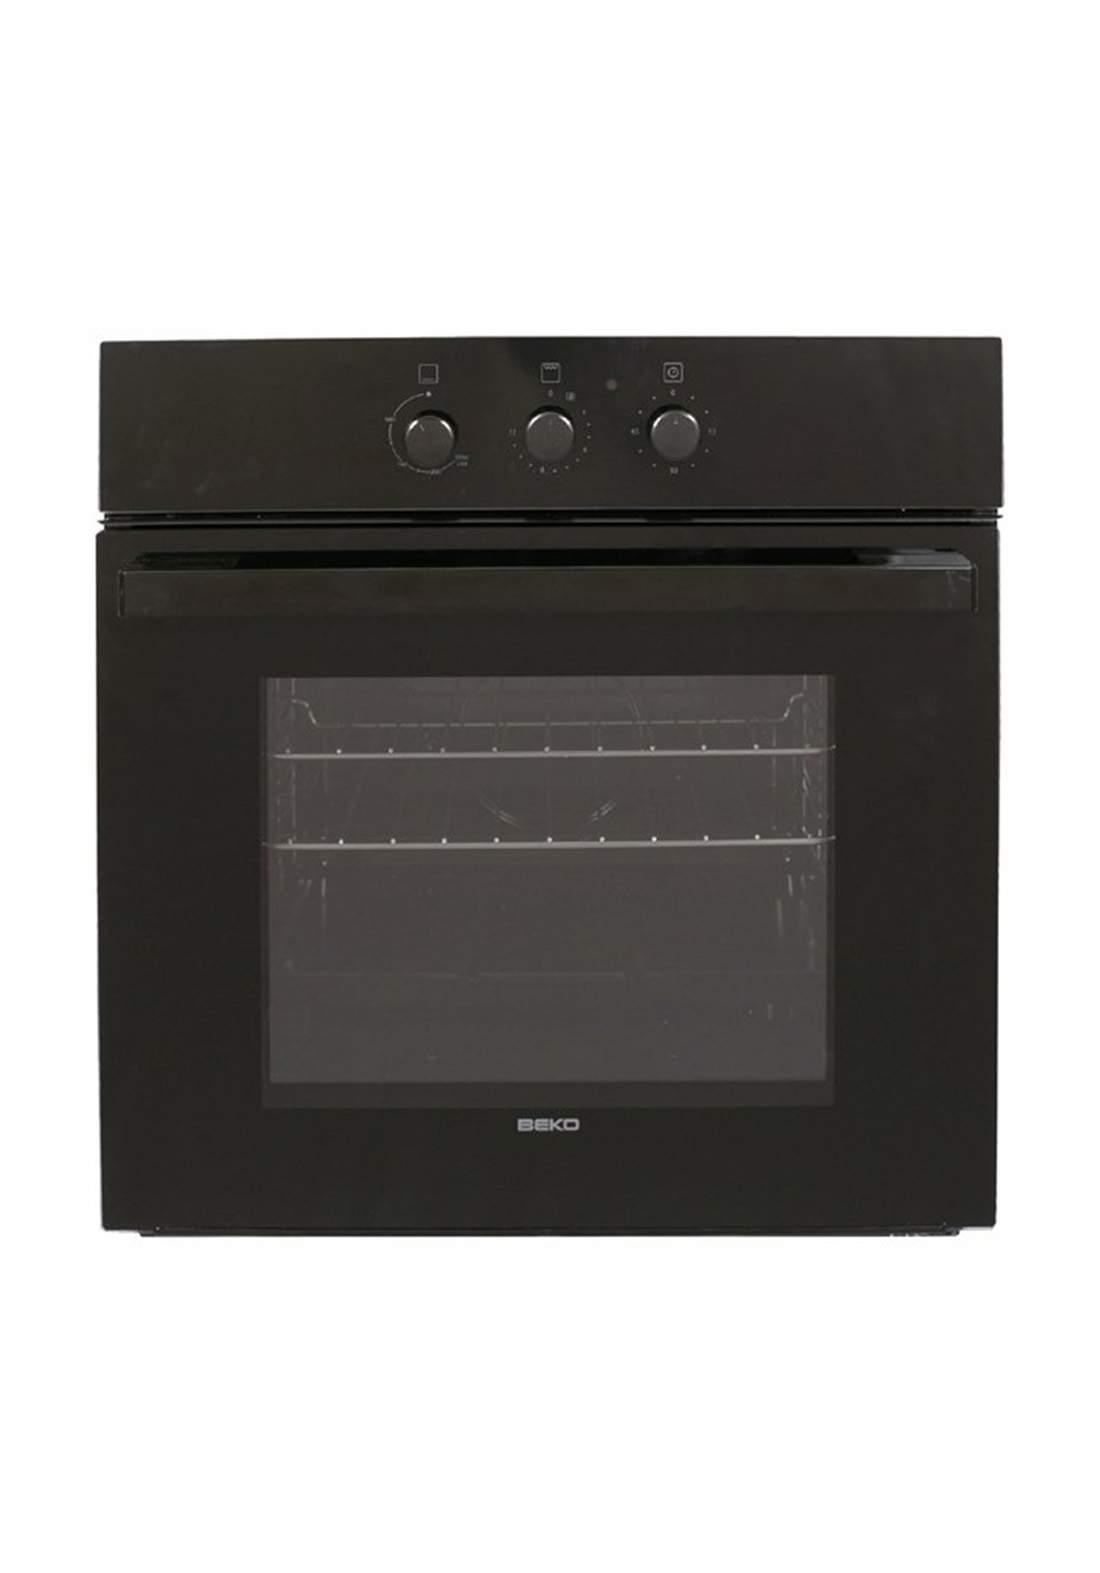 Beko Gas oven OIG 14101 B - Black فرن